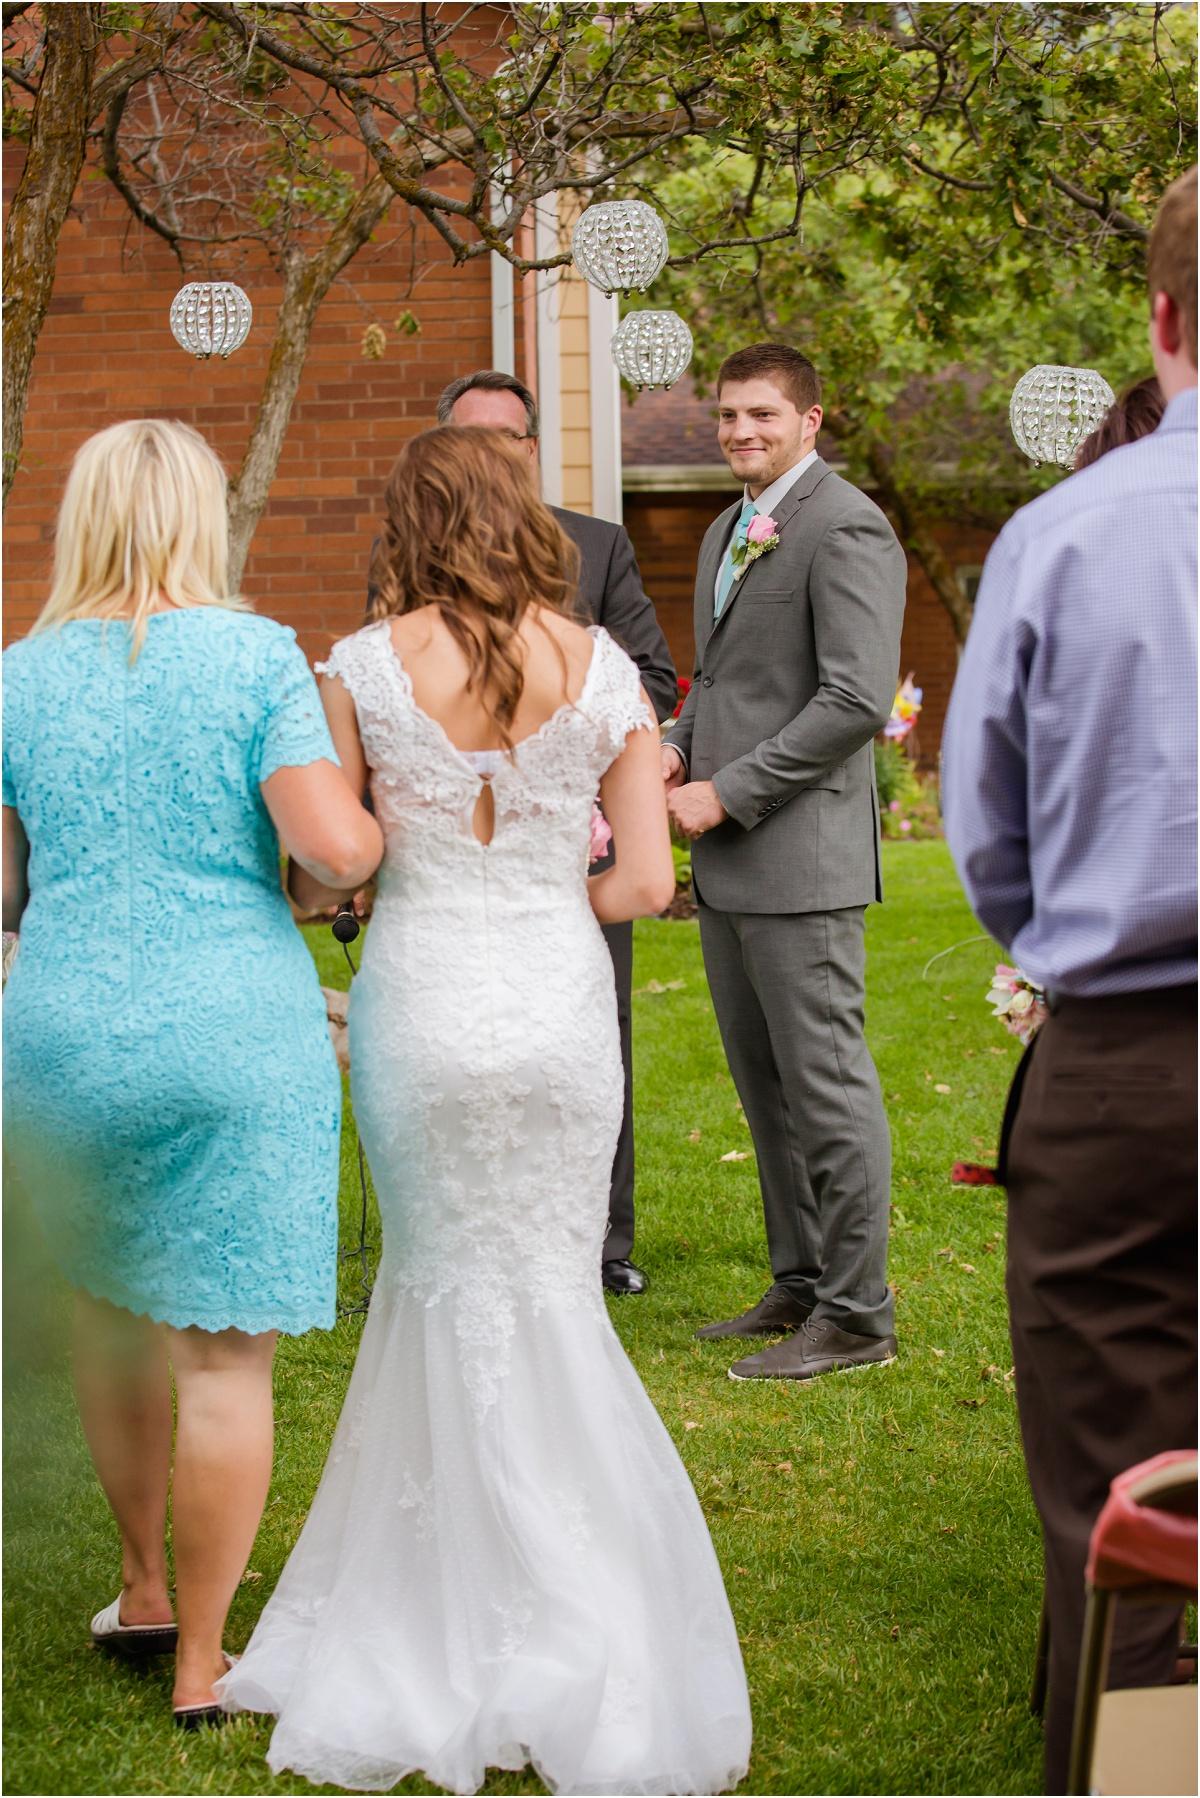 Davis County Private Venue Wedding Terra Cooper Photography_3457.jpg